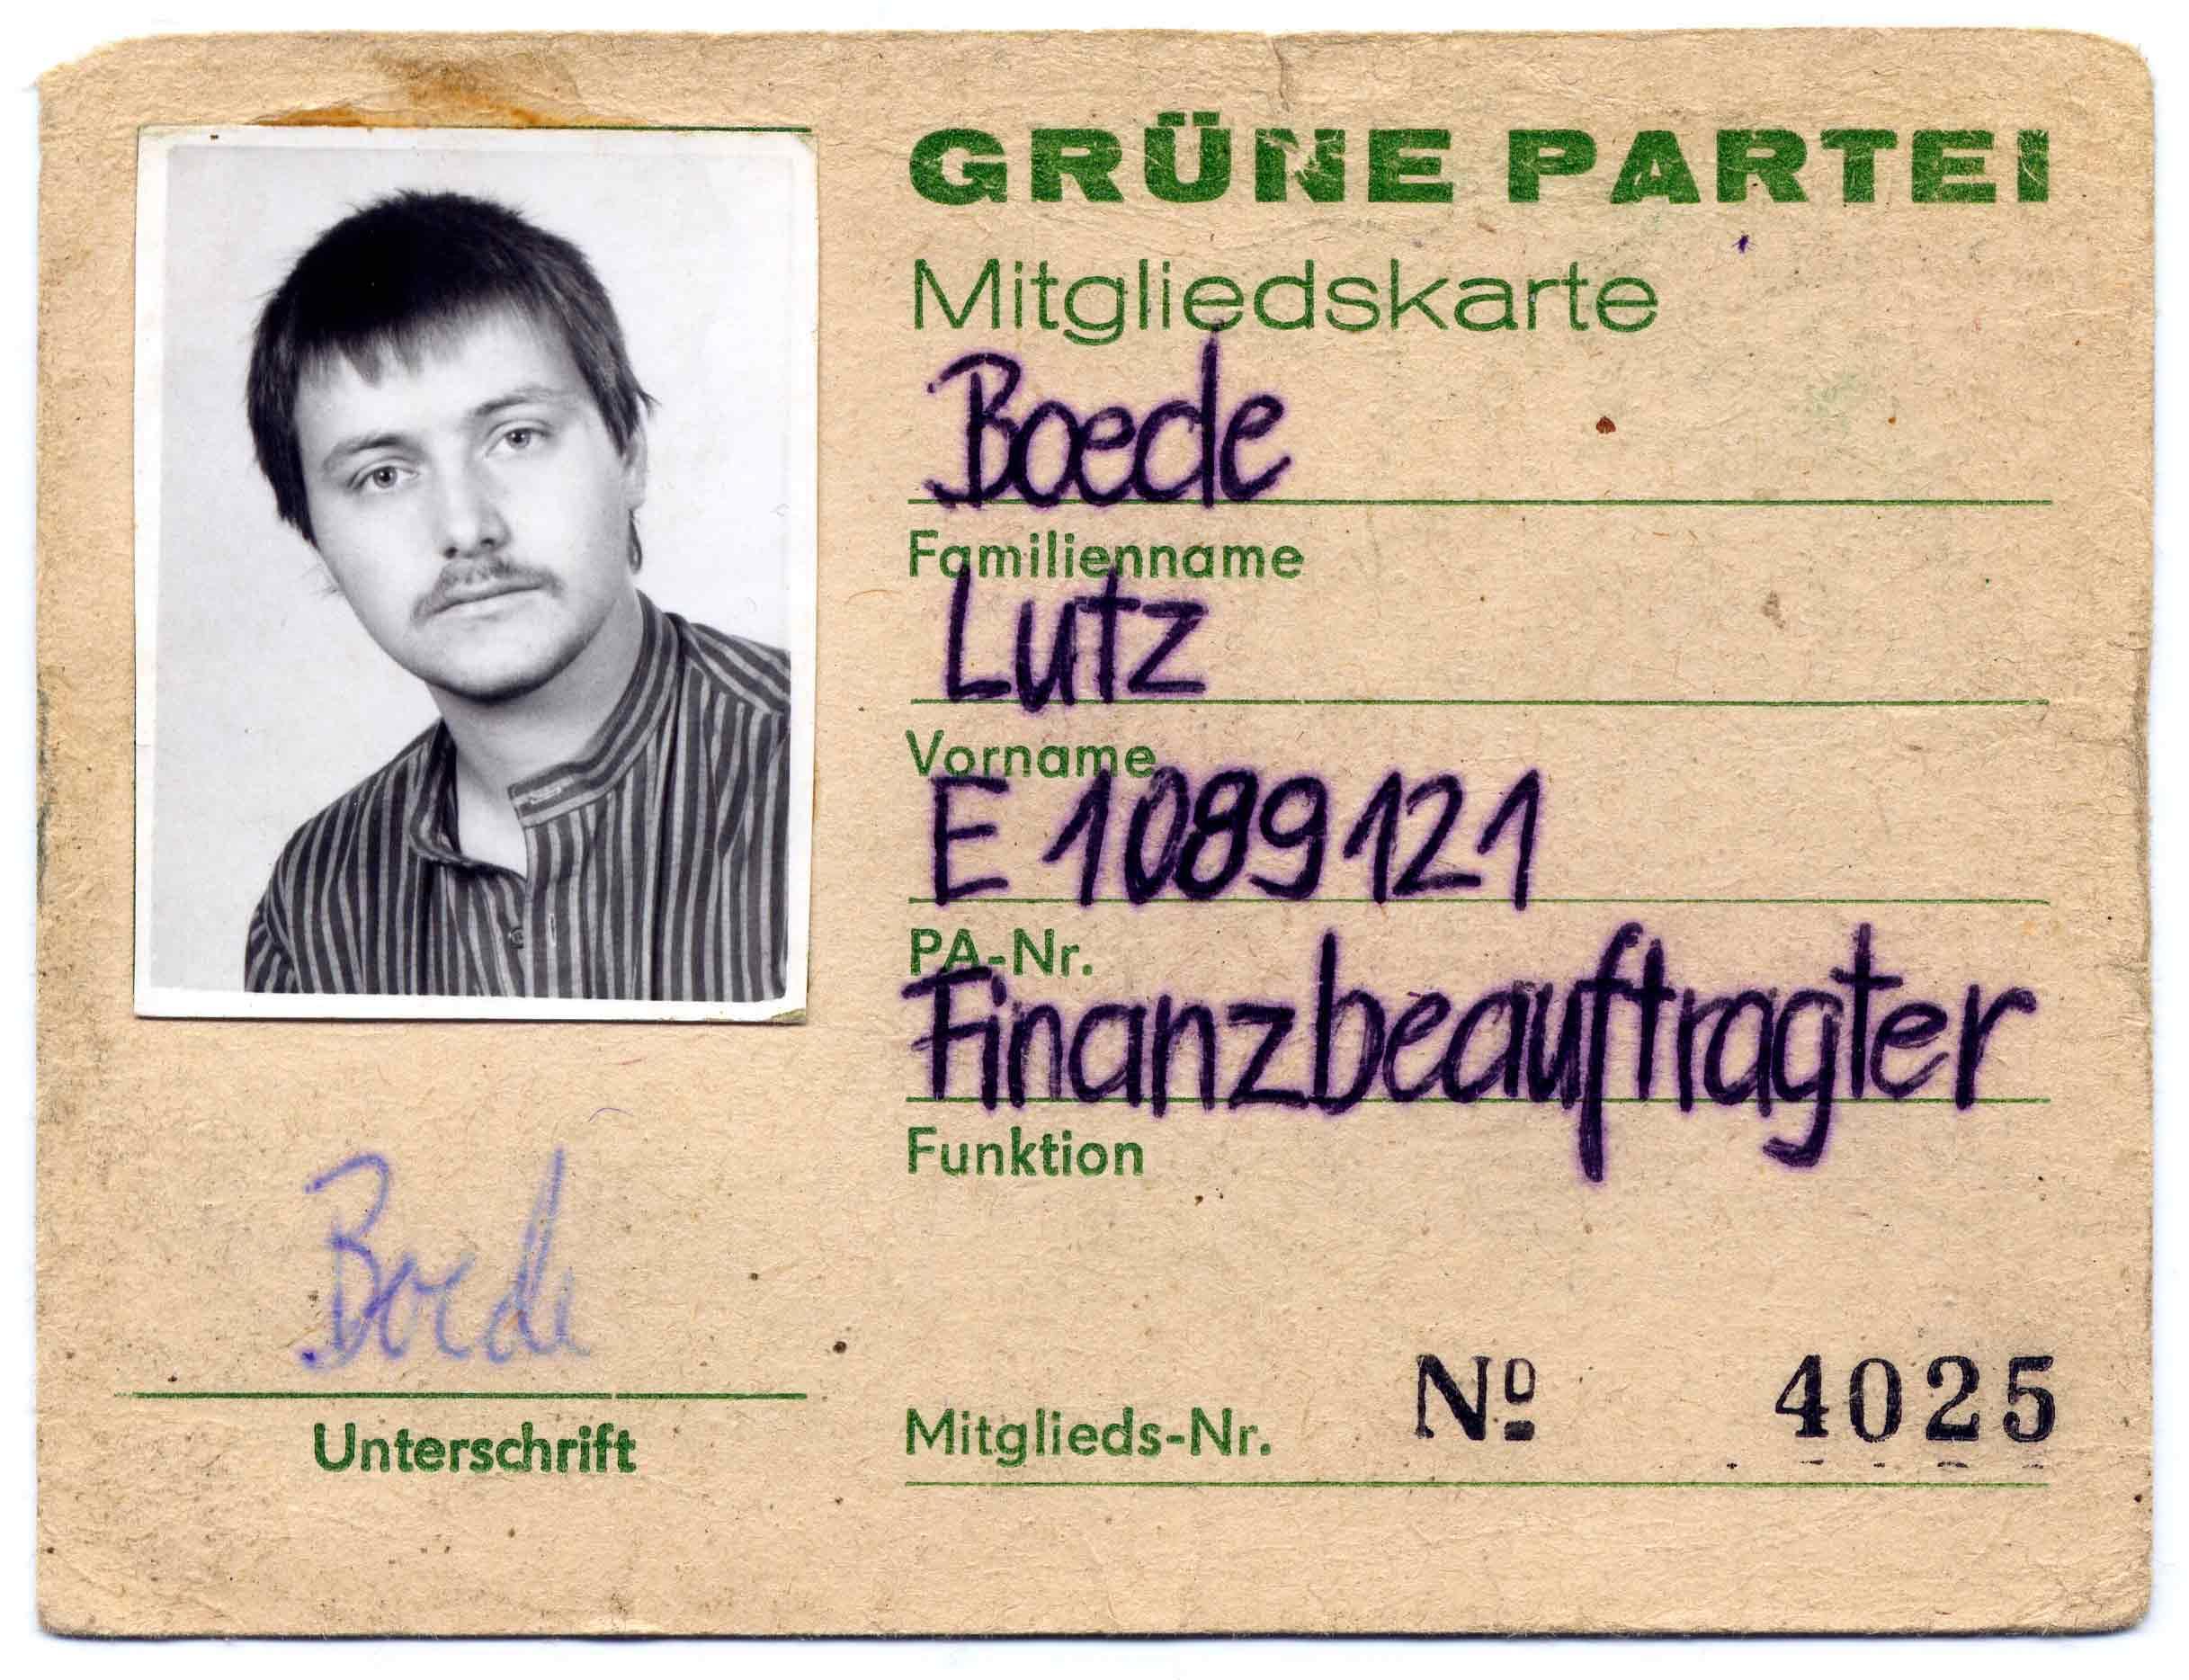 Mitgliedsausweis Gruene Lutz Boede